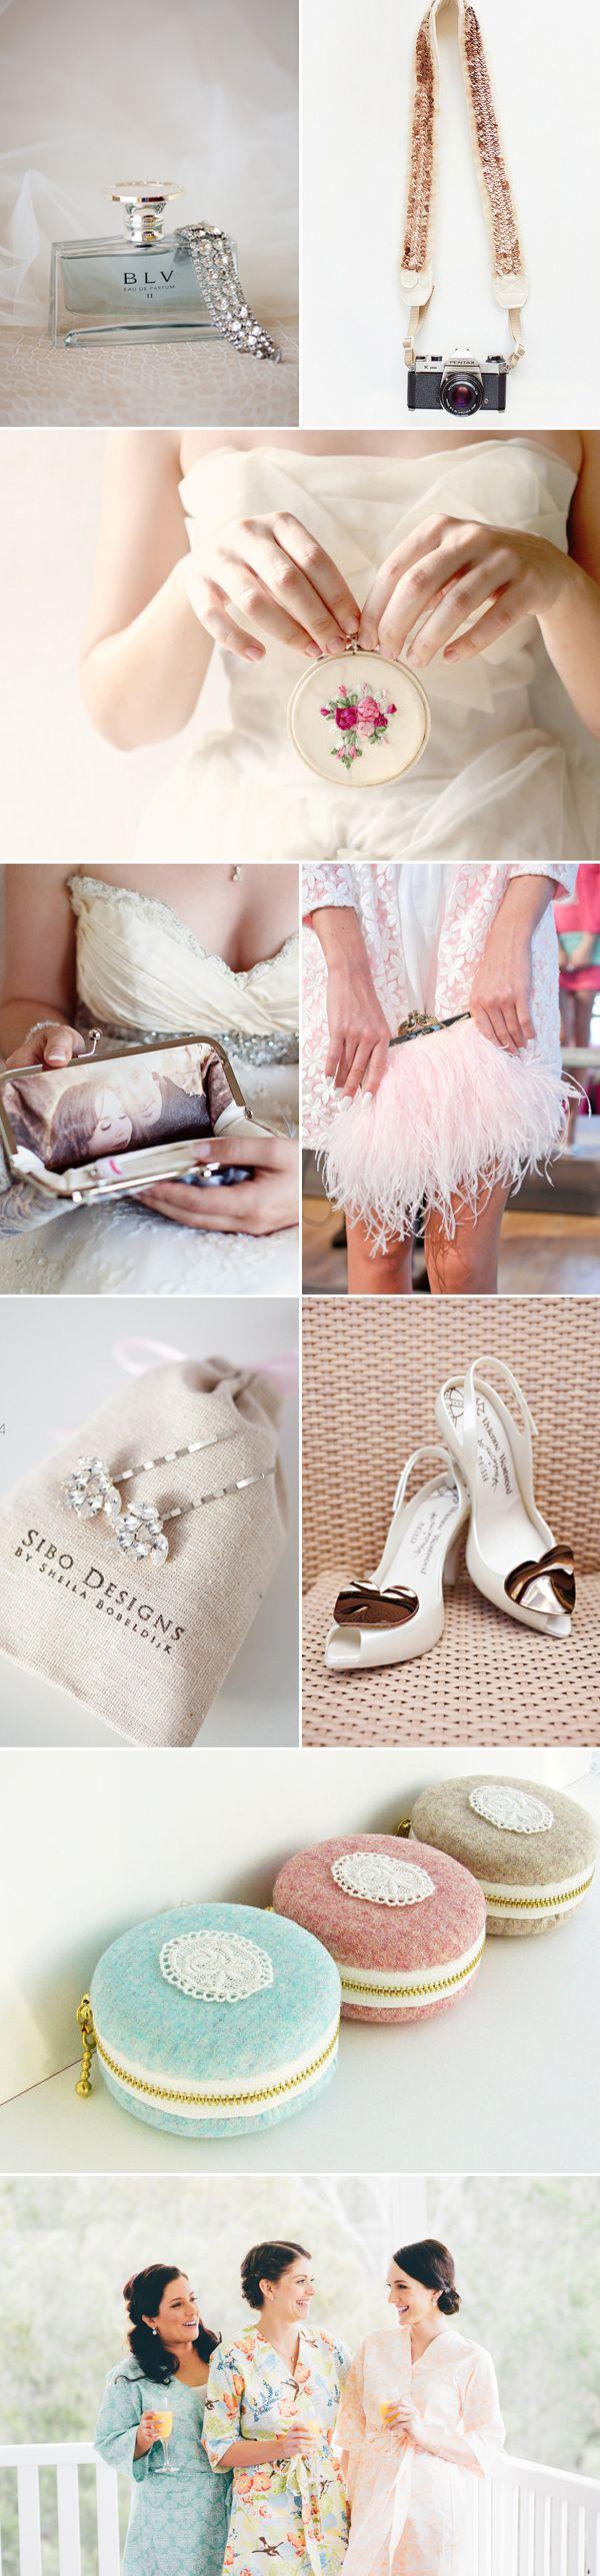 bridal shower gift ideas for bride philippines%0A    Beautiful  u     Useful Bridal Shower Gifts  Praise Wedding